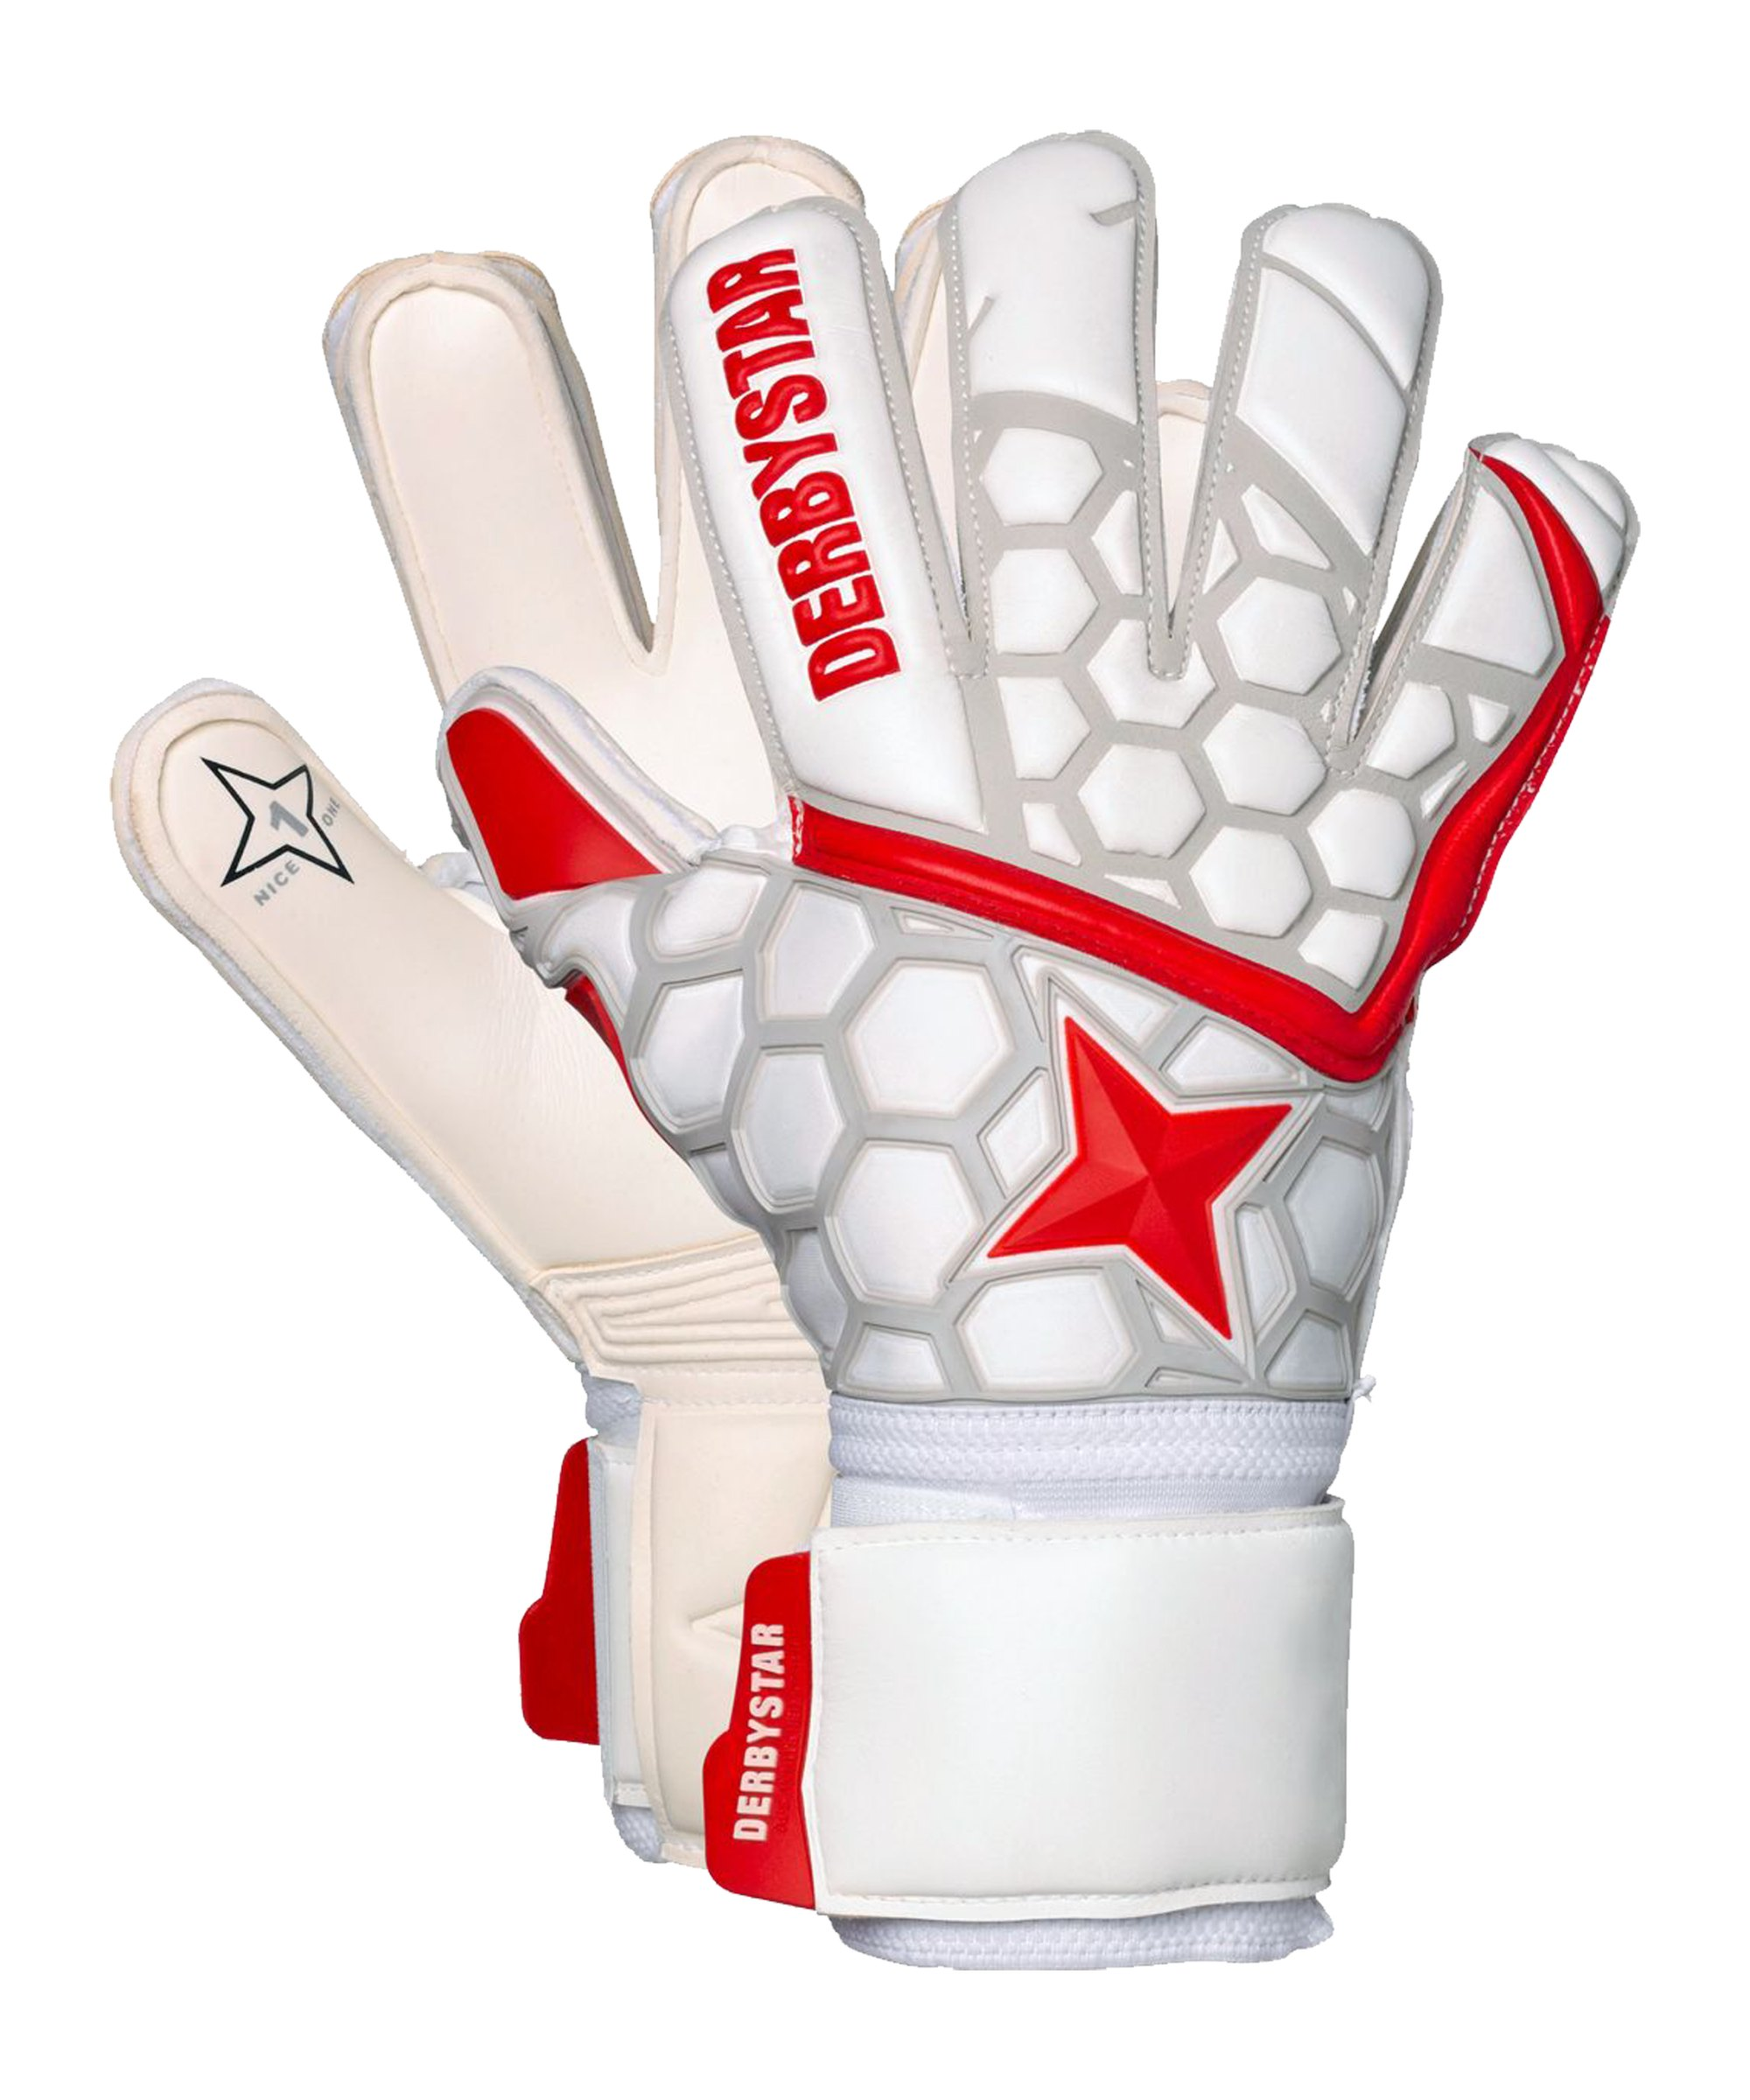 Derbystar APS Star II TW-Handschuh Weiss Rot F000 - weiss